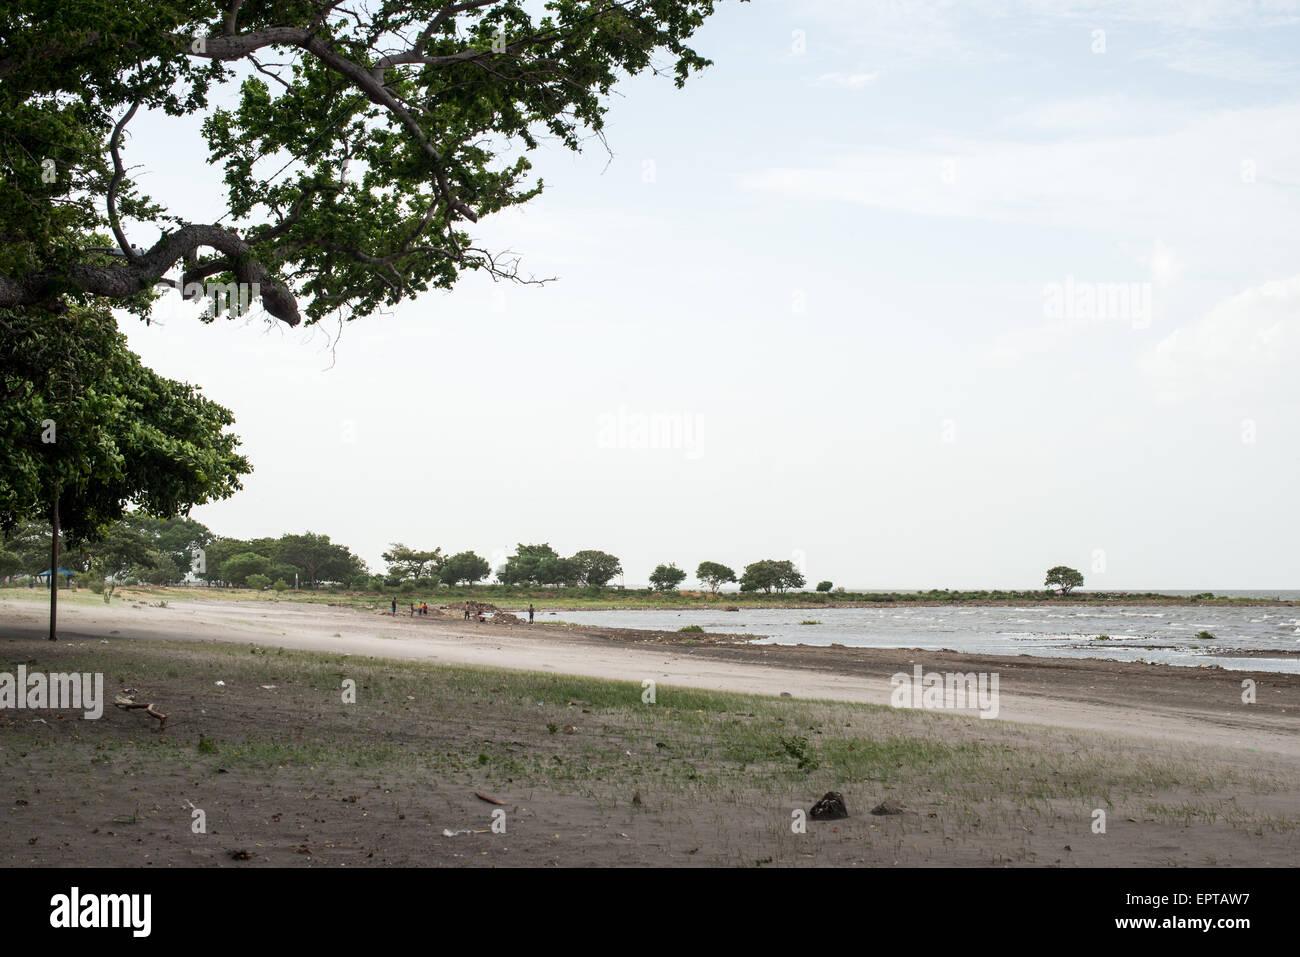 Lake Nicaragua Beach at Centro Turistico, Granada, Nicaragua - Stock Image